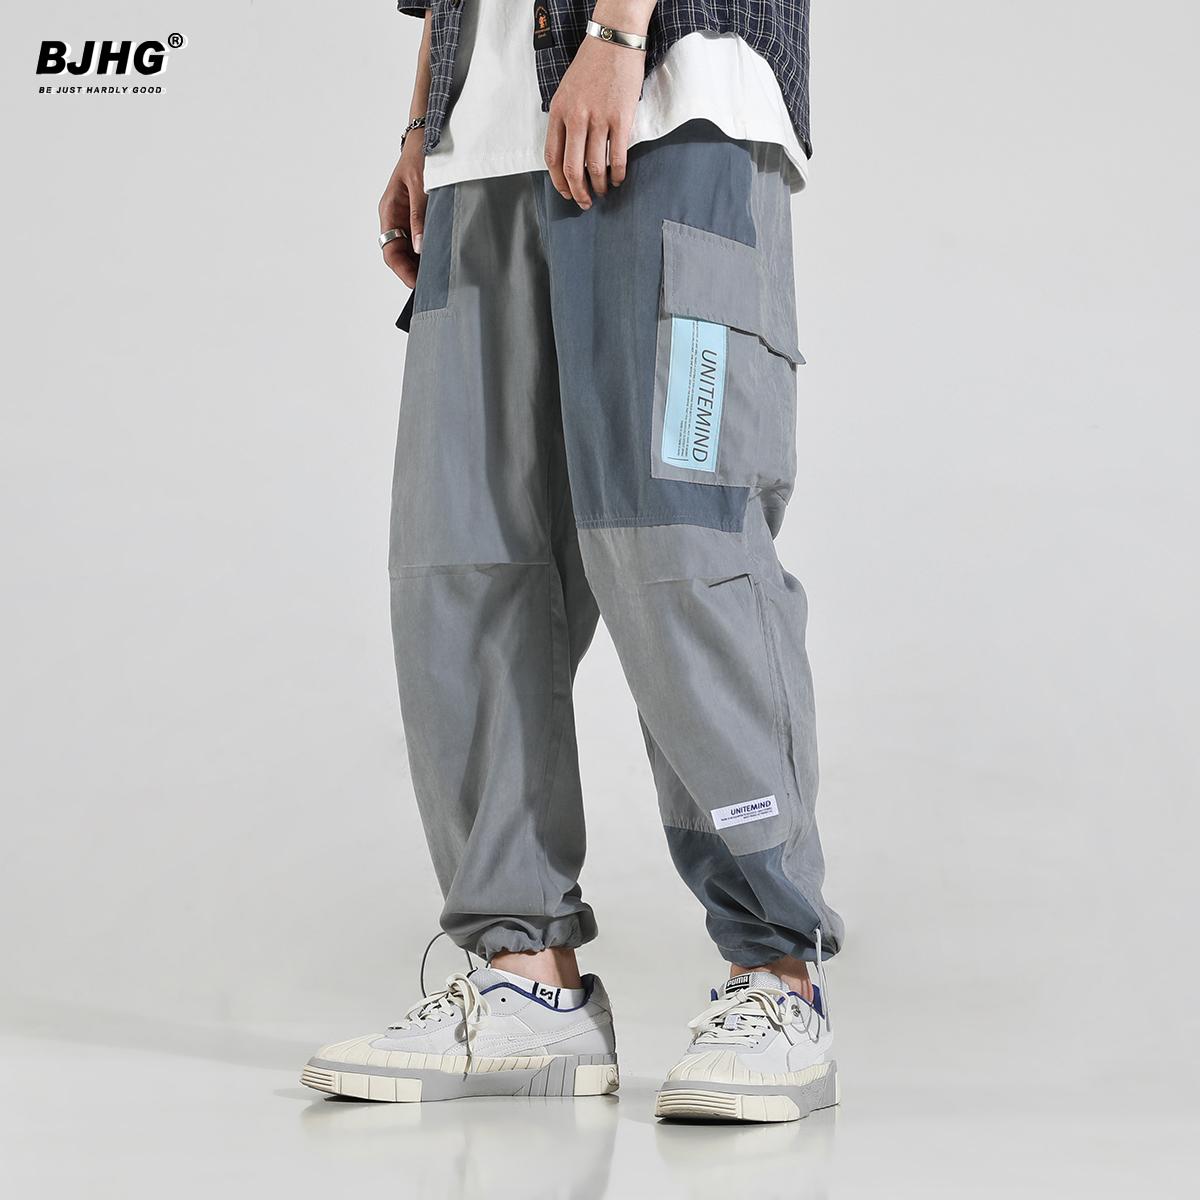 bjhg早秋休闲工装裤男国潮流哈伦裤(用71元券)